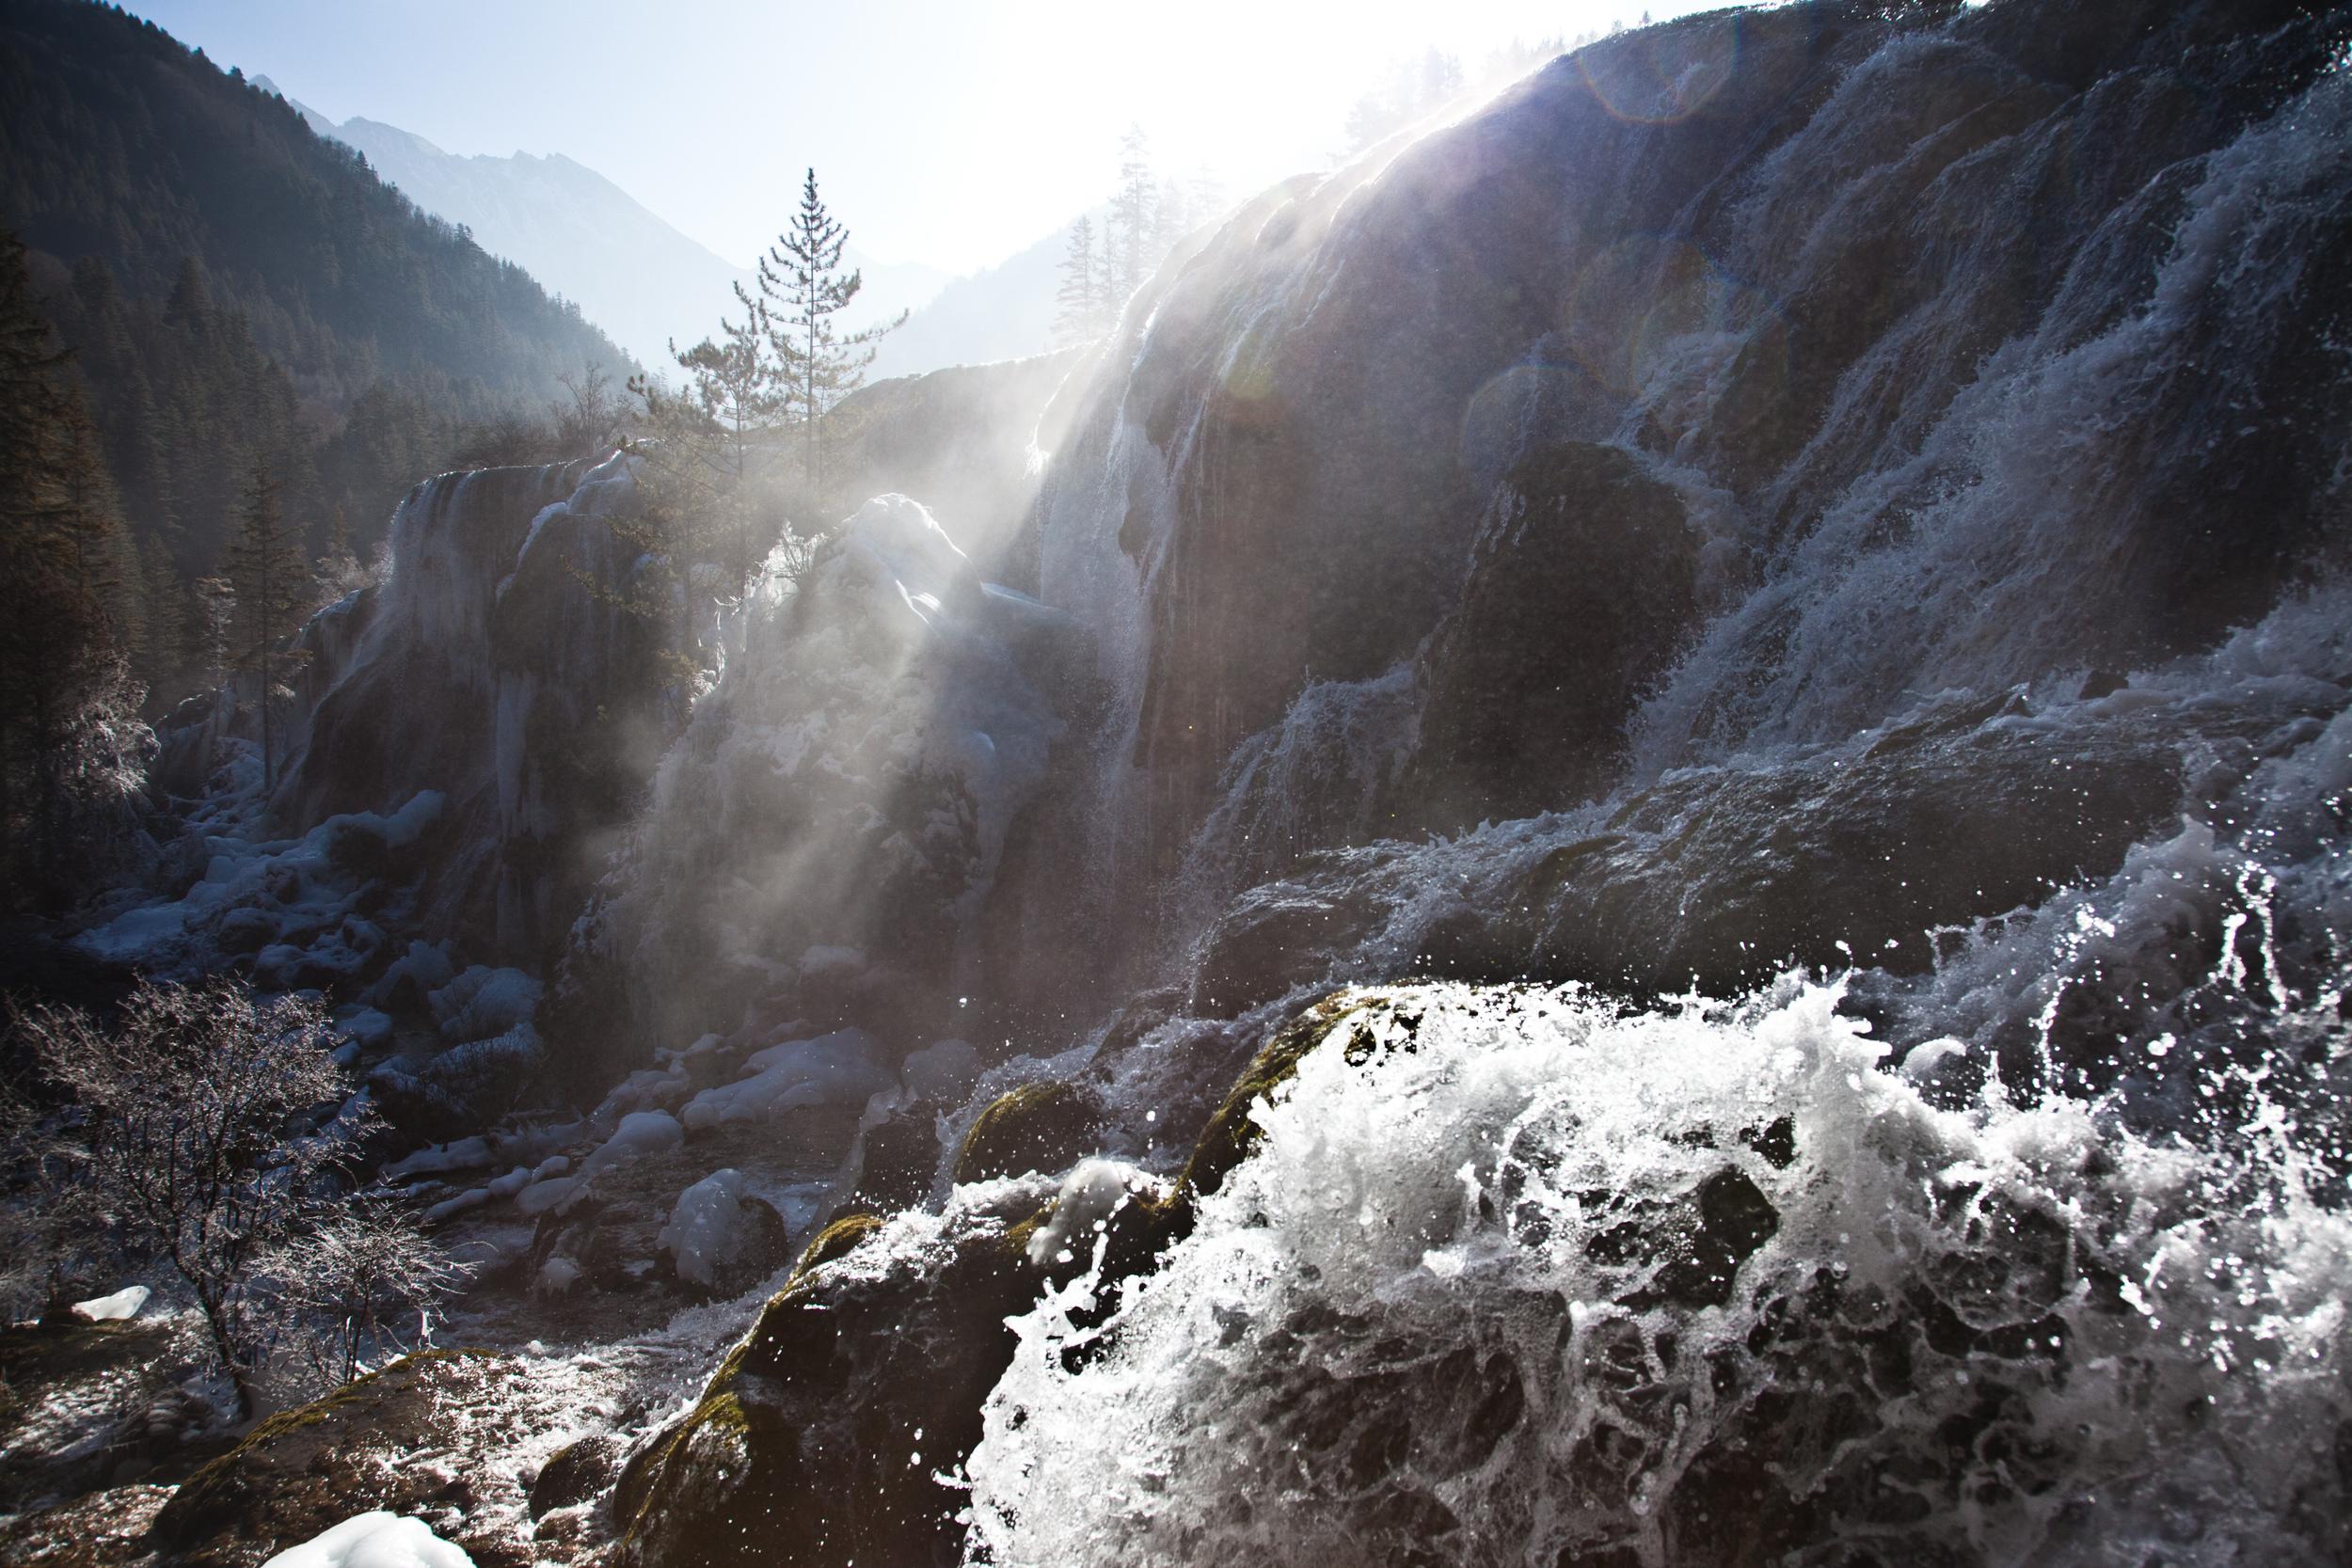 frozen falls, pear fall, Jiuzhaigou national park